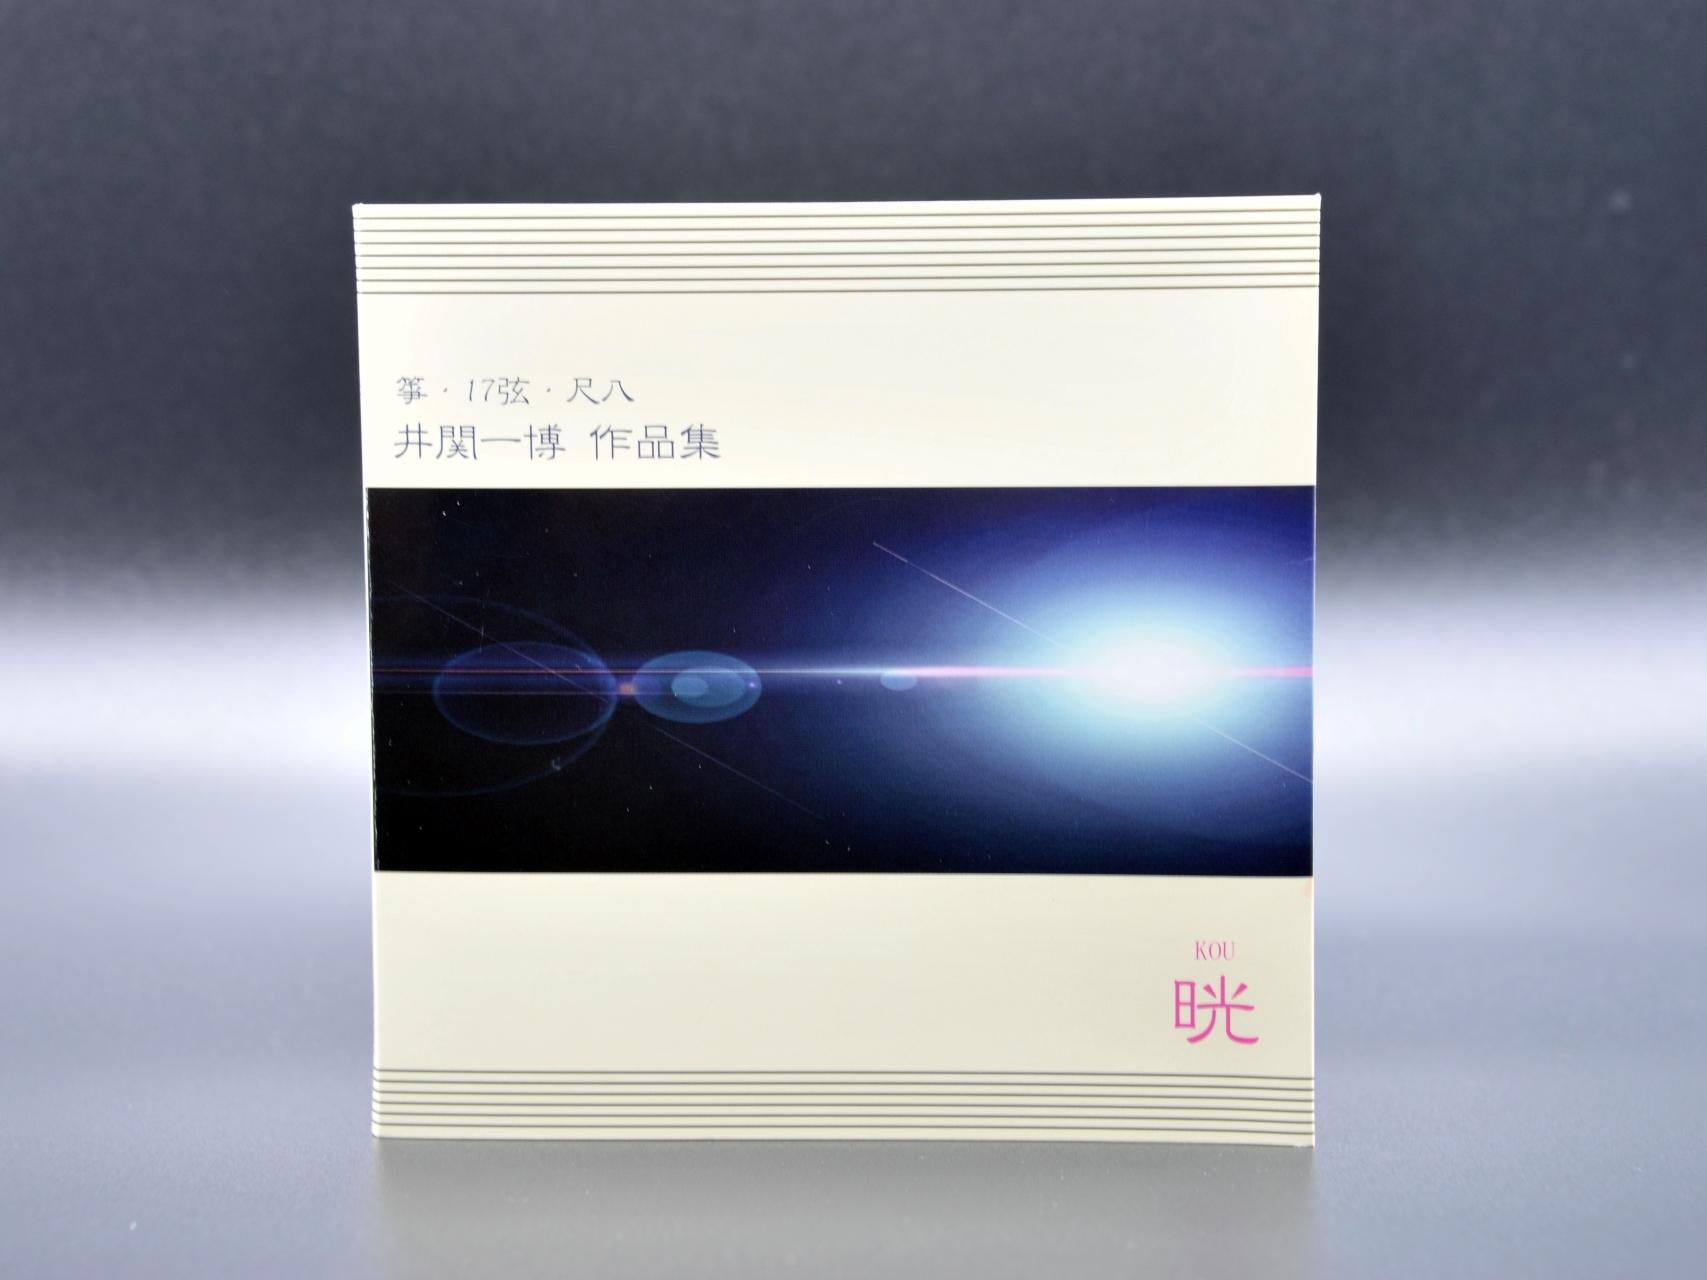 CD「晄kou 井関一博作品集」